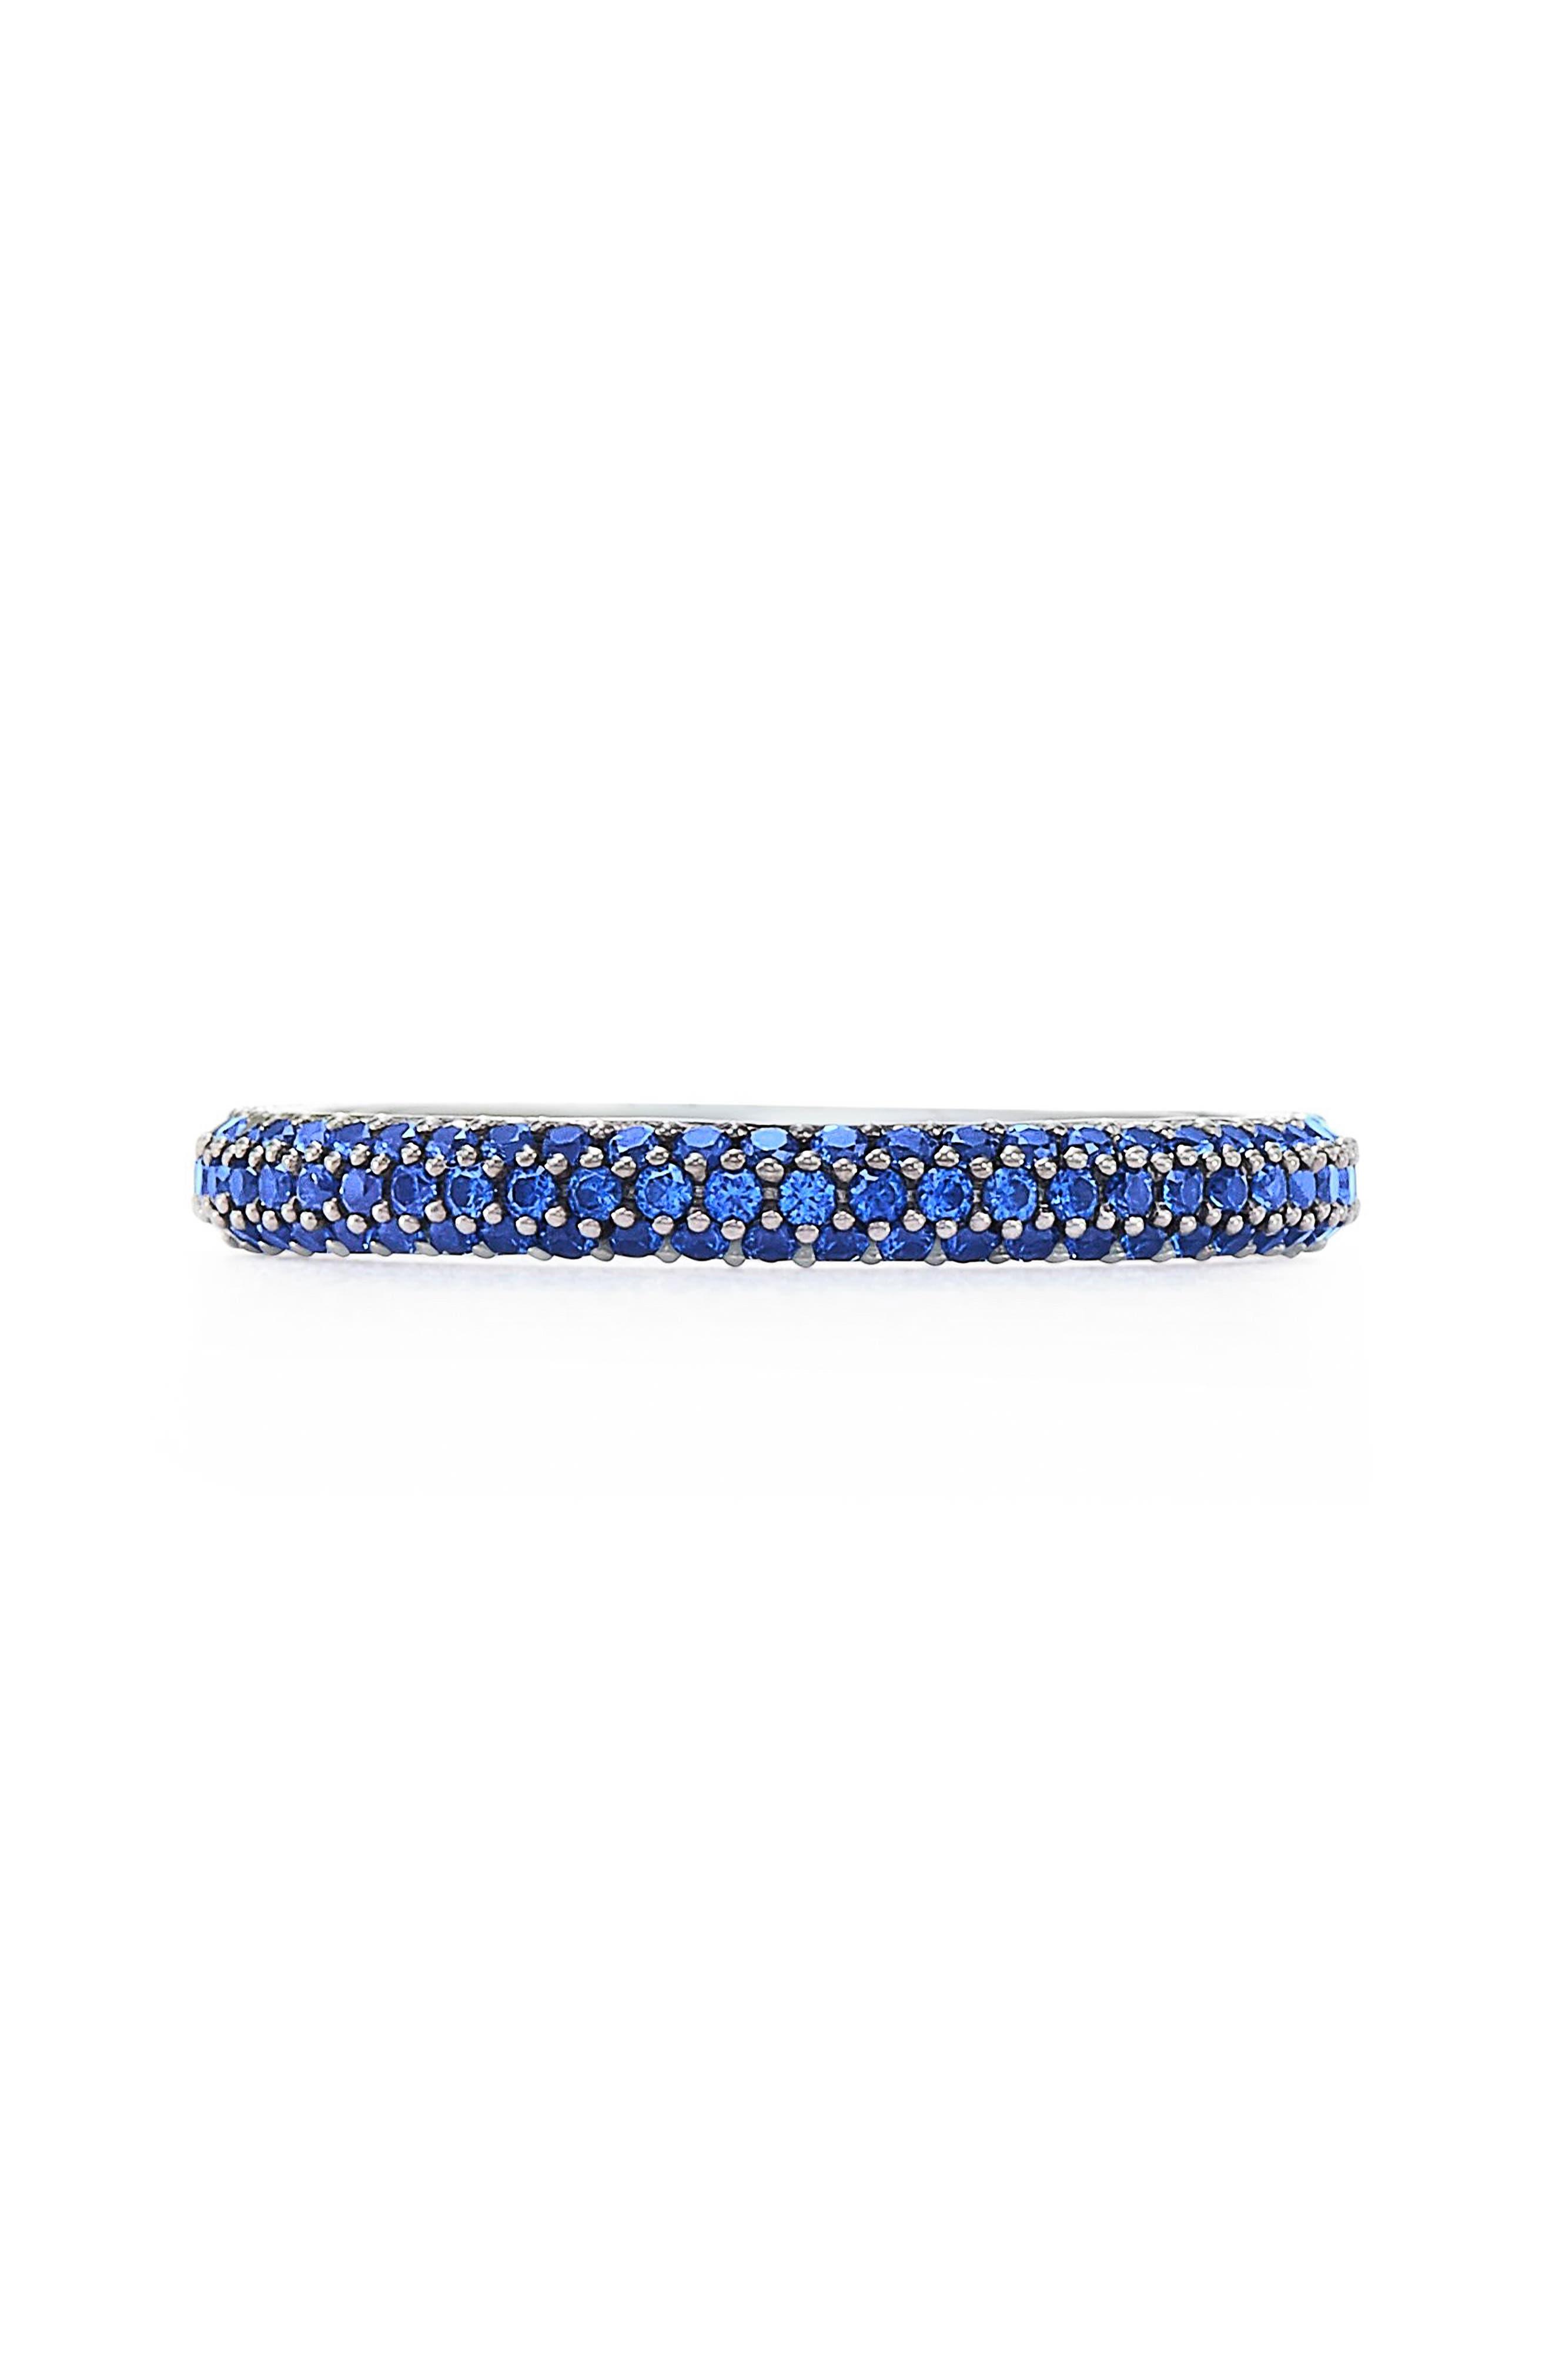 Moonlight Sapphire Stacking Ring,                             Main thumbnail 1, color,                             711